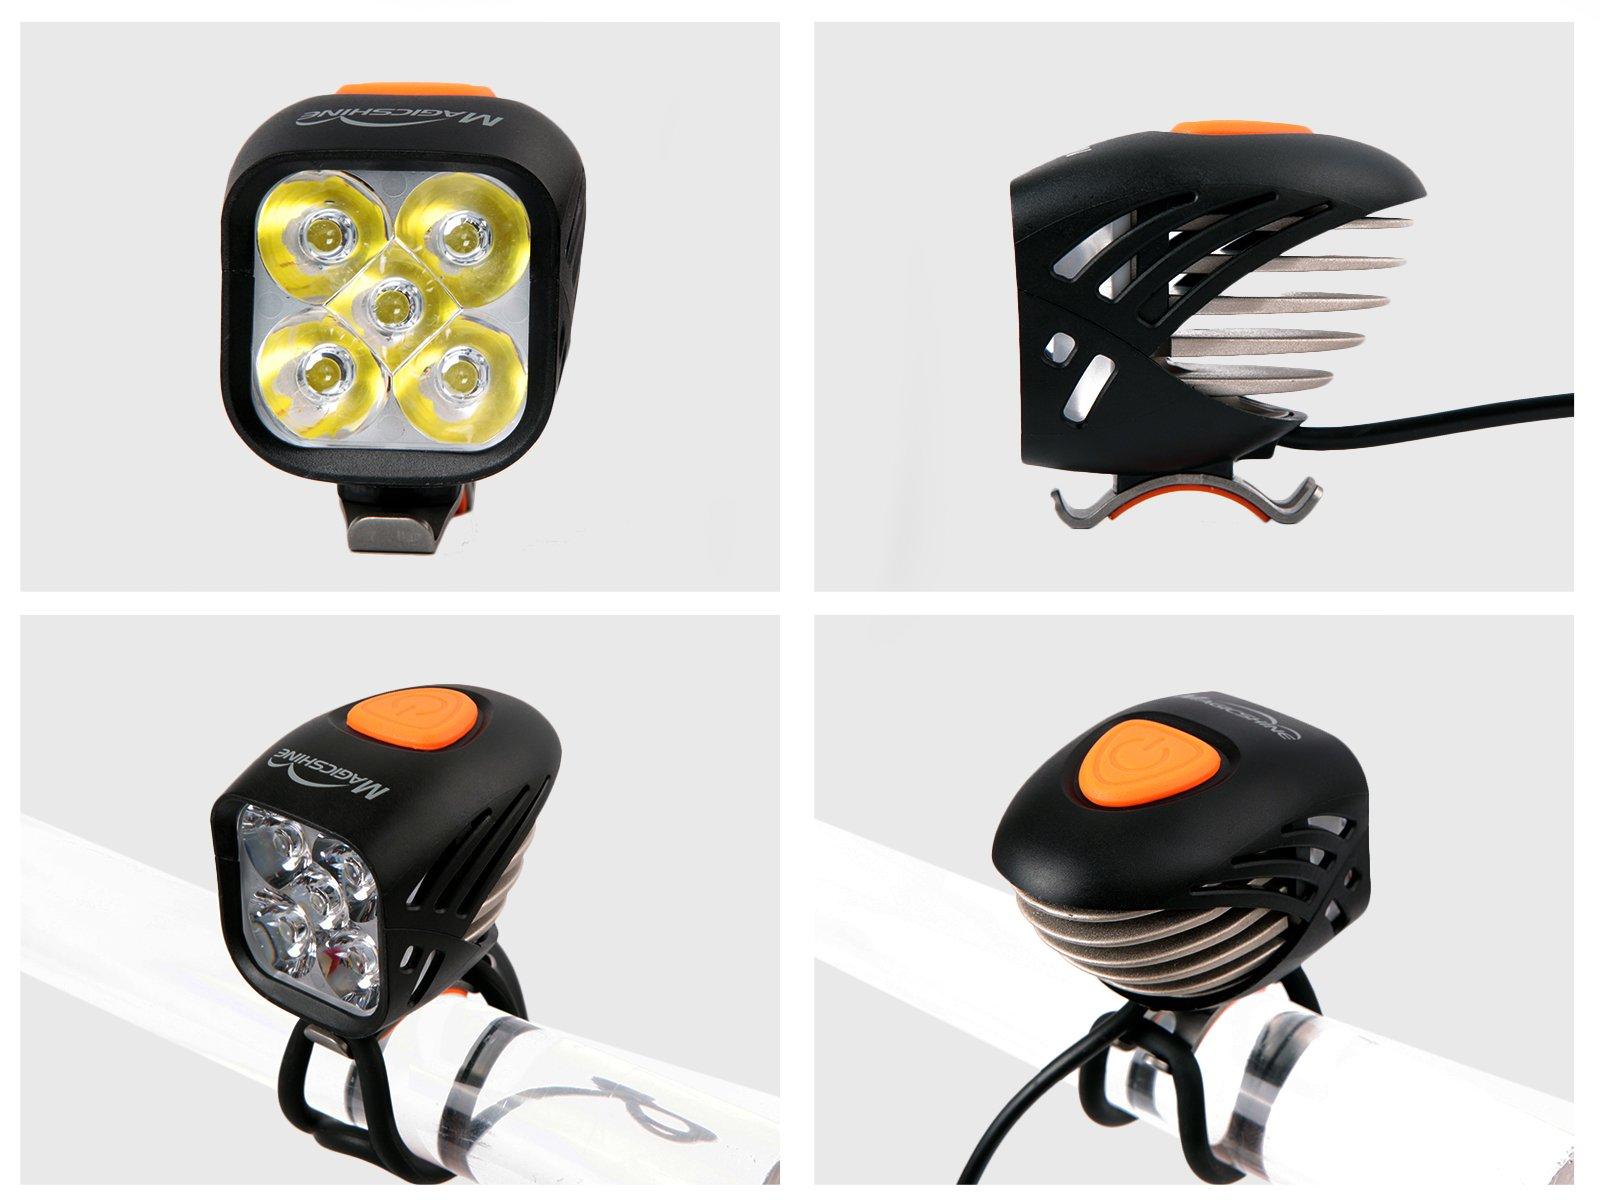 Magicshine MJ 906, High Grade MTB Enduro Bike Light Set, 5000 Lumens of Max output. Wireless Remote Bicycle Lights Front And Rear Combo, LED Bike Tail Light, Perfect Beam Pattern Bright Bike Light by Magicshine (Image #5)